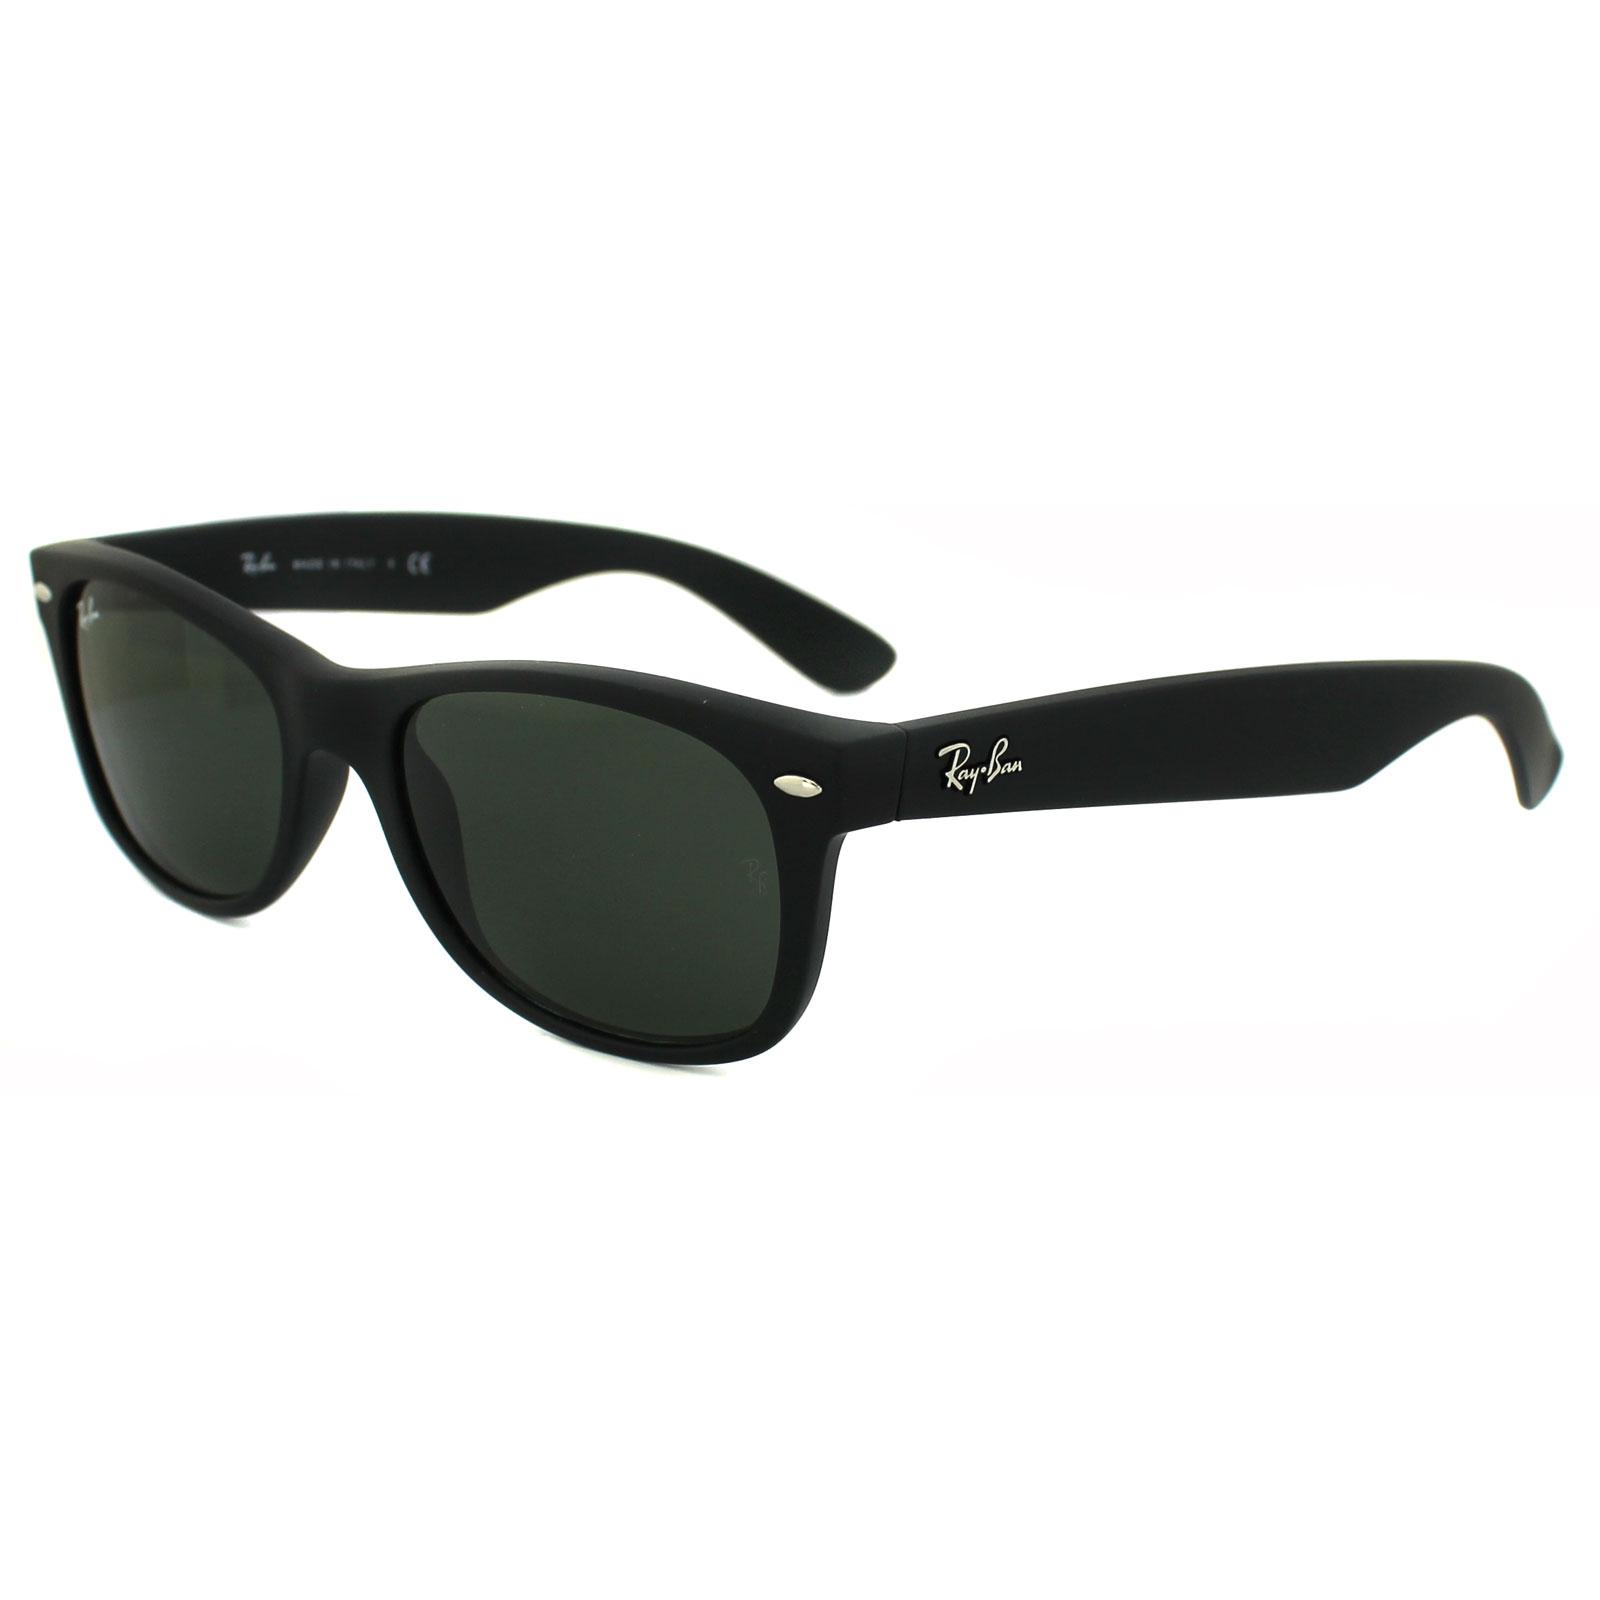 Ray Ban Sunglasses New Wayfarer 2132 622 Black Rubber Ebay